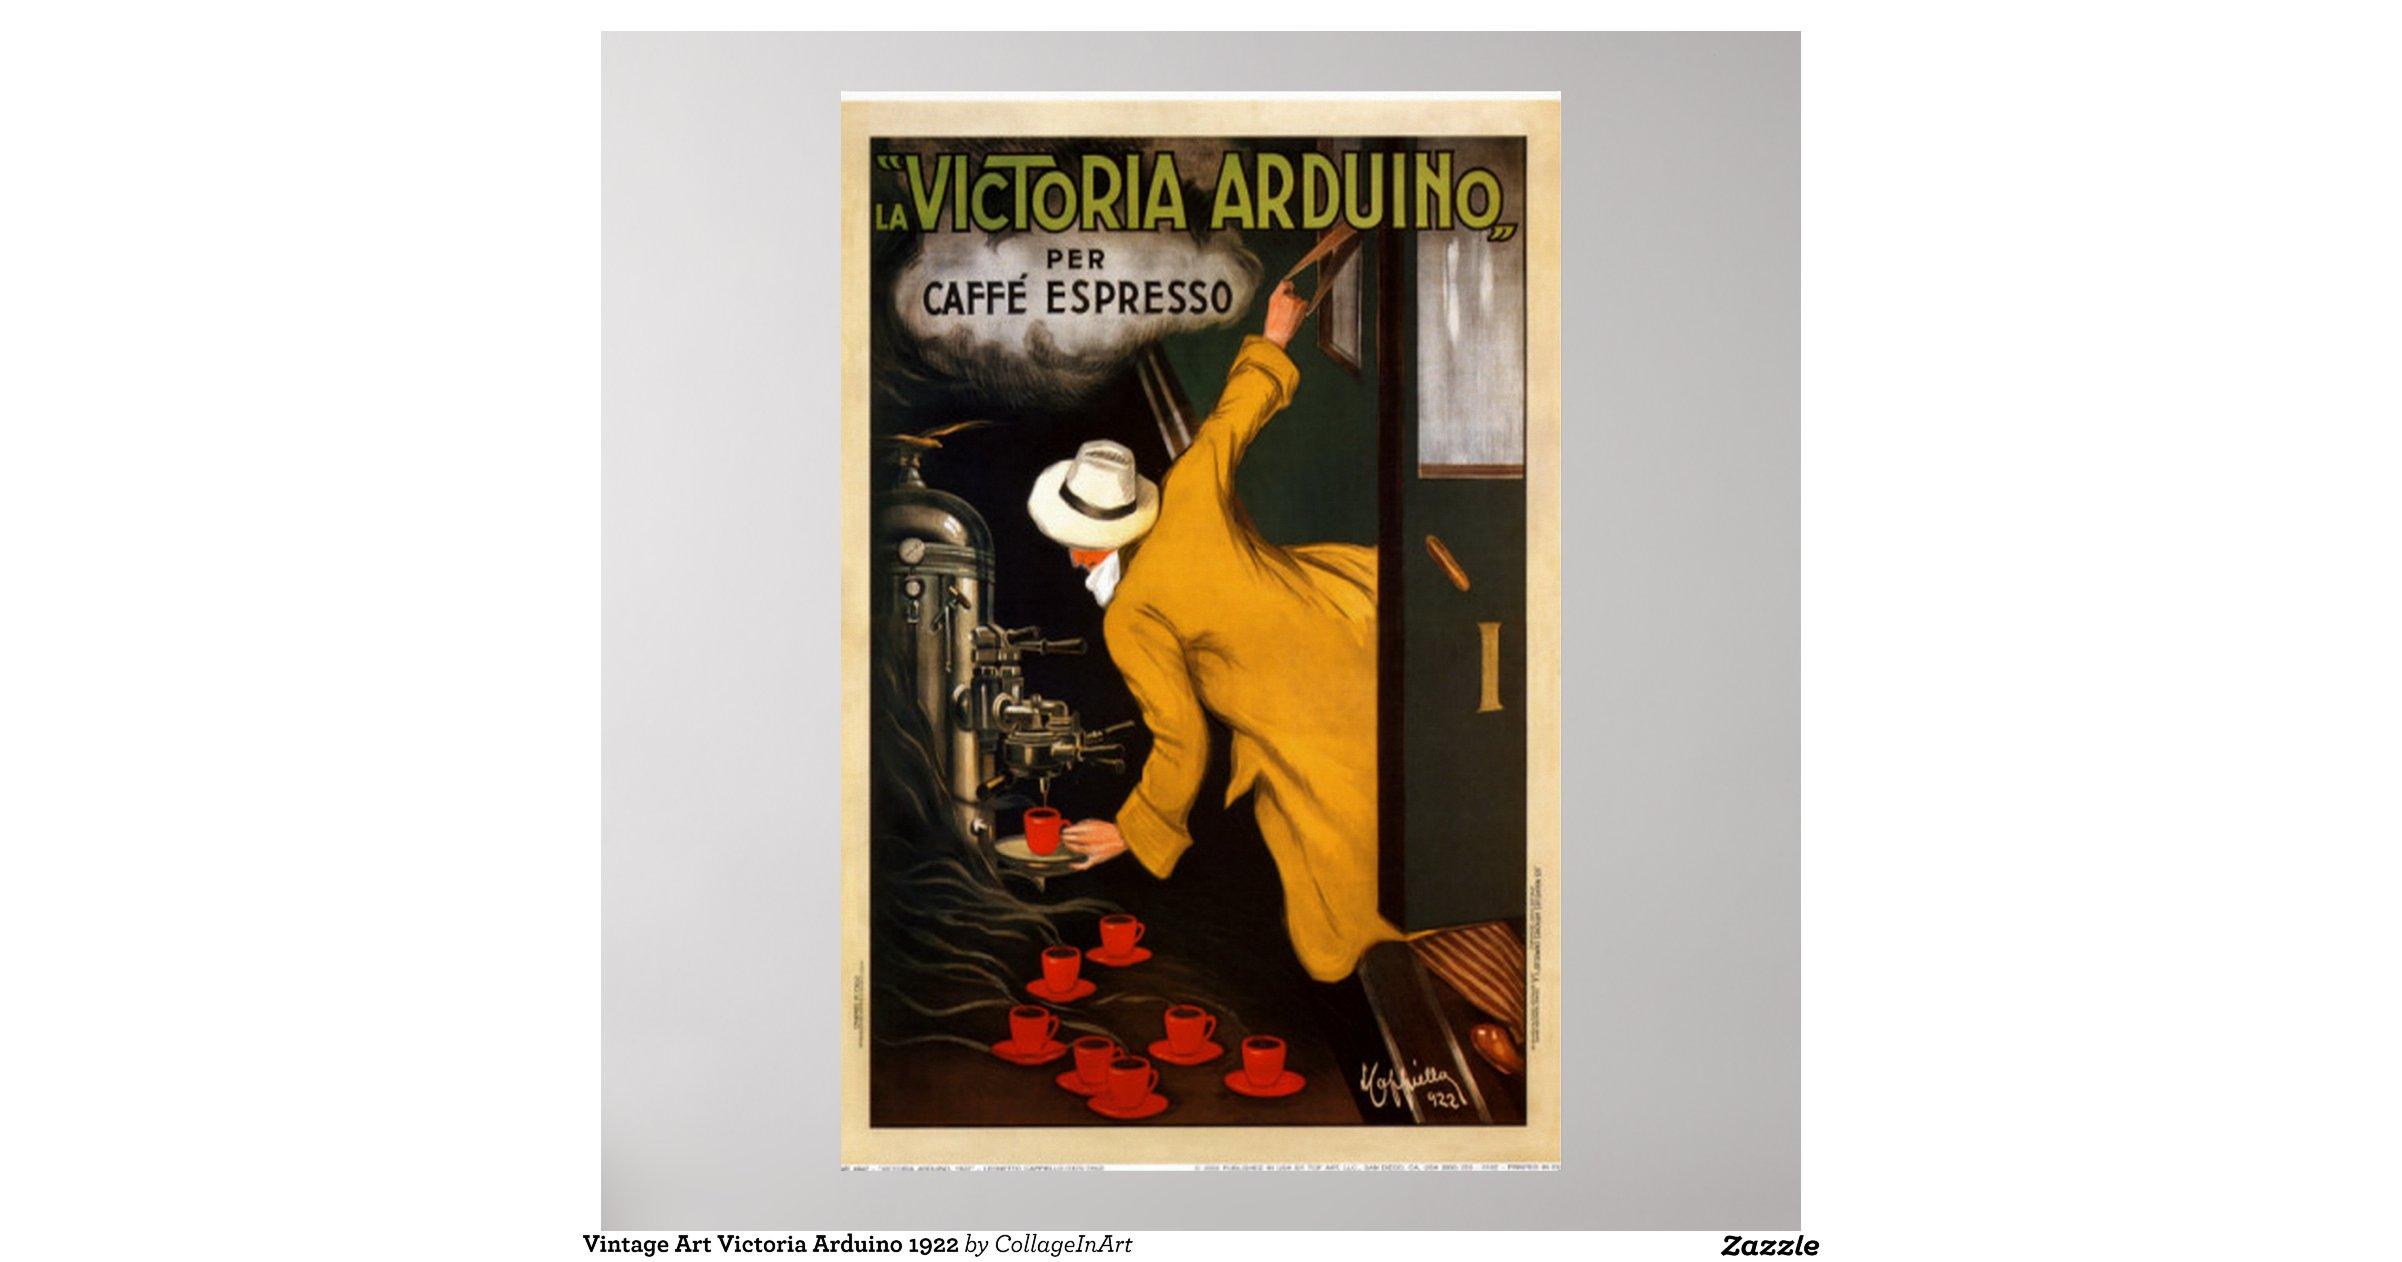 Vintage art victoria arduino poster zazzle